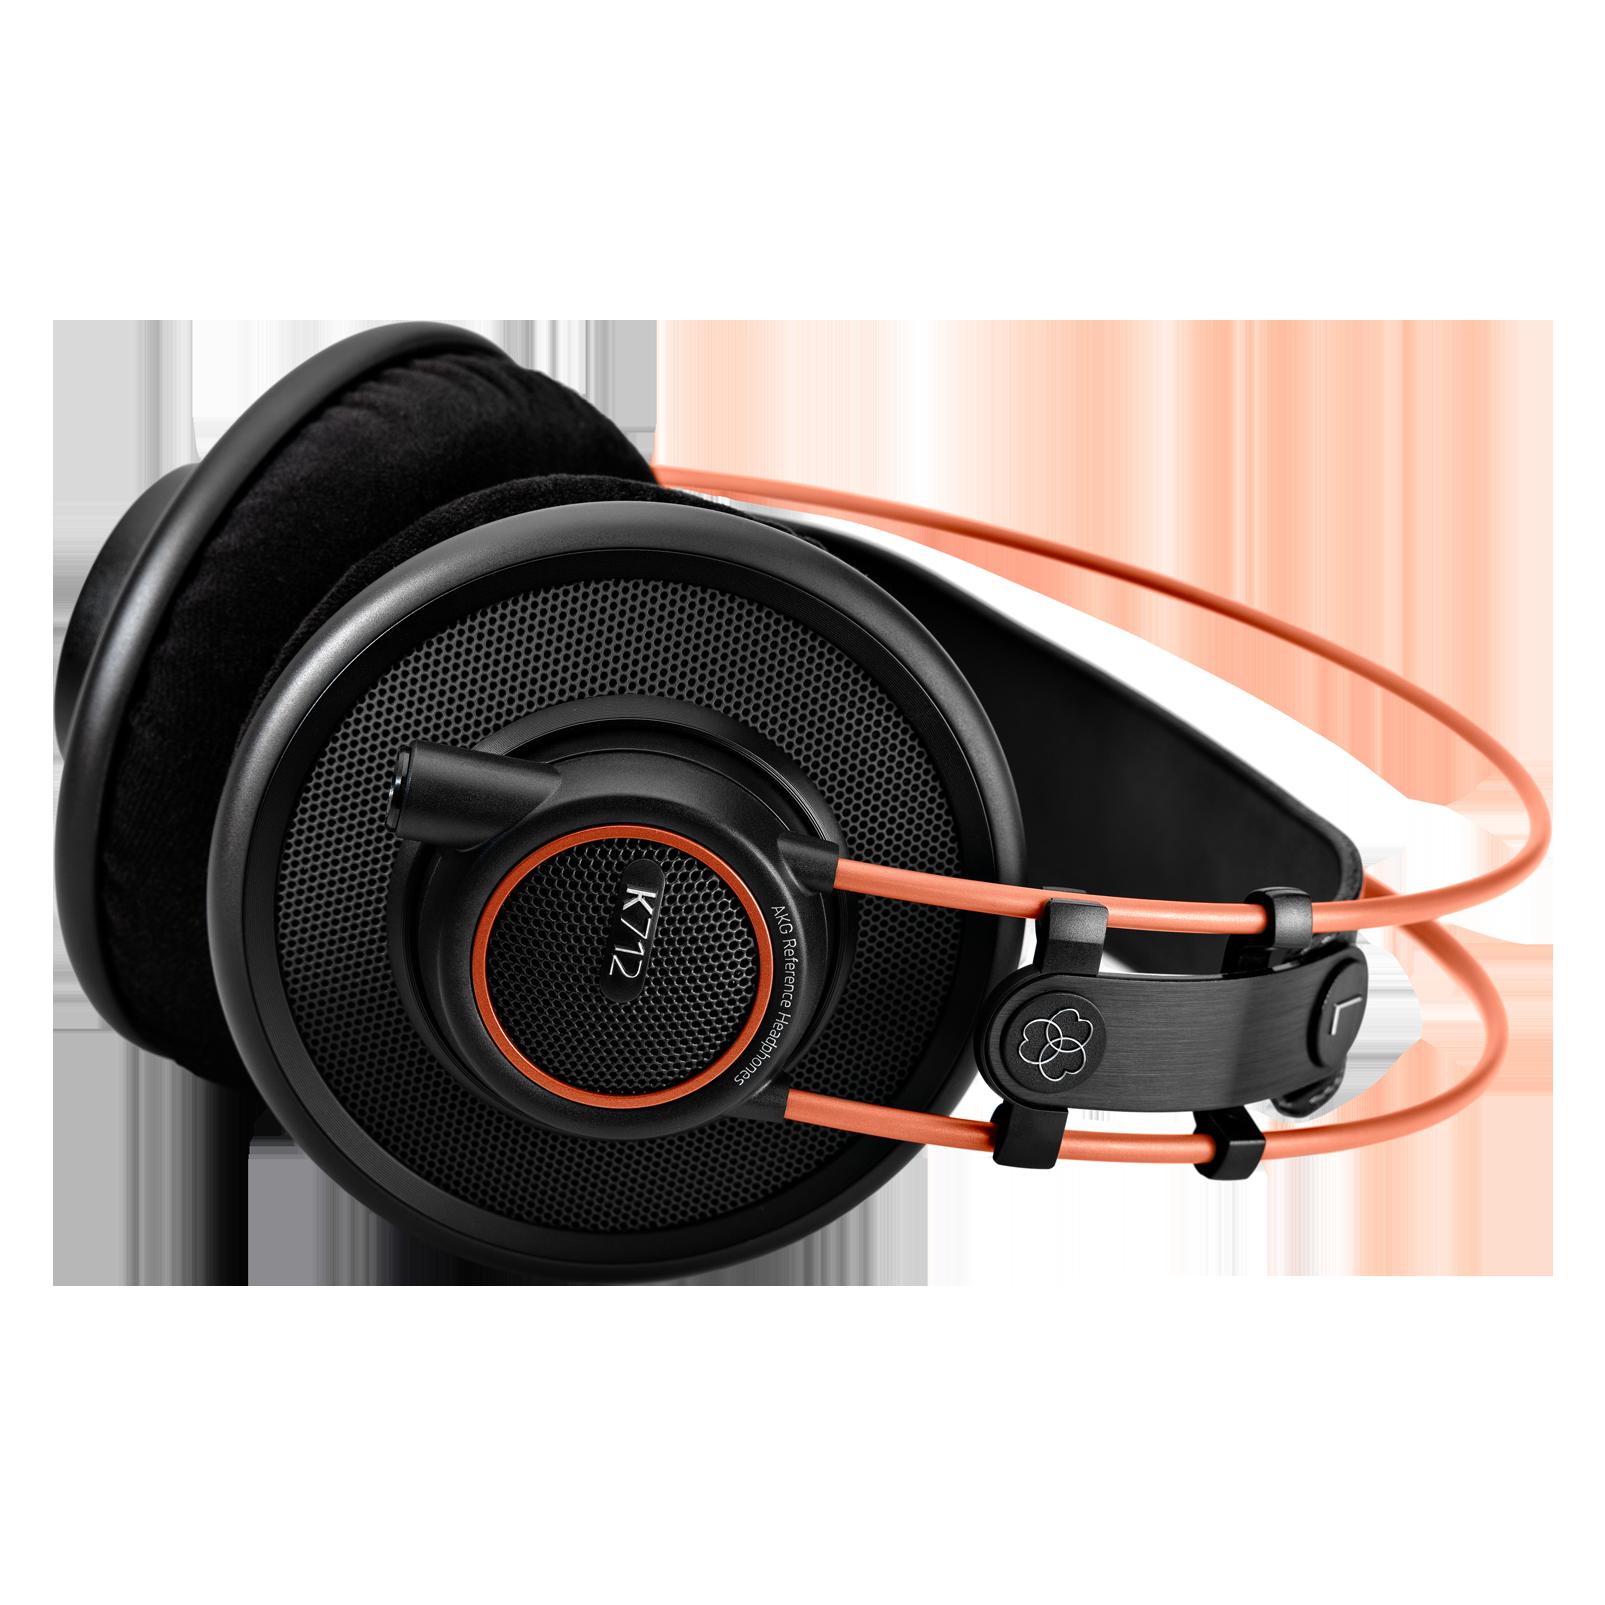 K712 PRO - Black - Reference studio headphones  - Detailshot 3